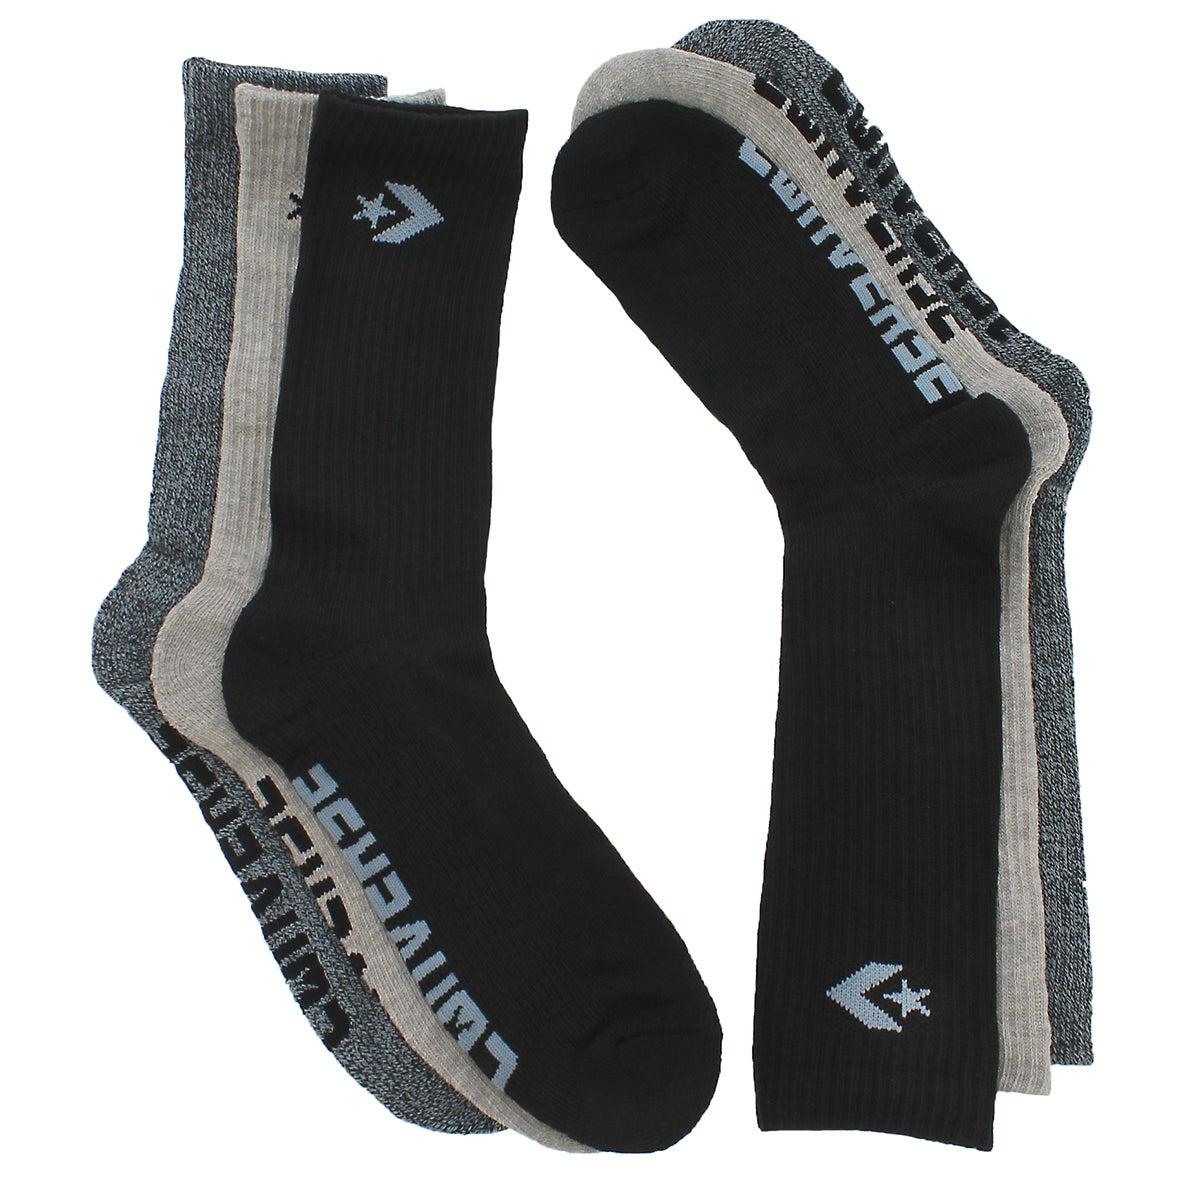 Mns Converse Star Crew mlti sock 3pk